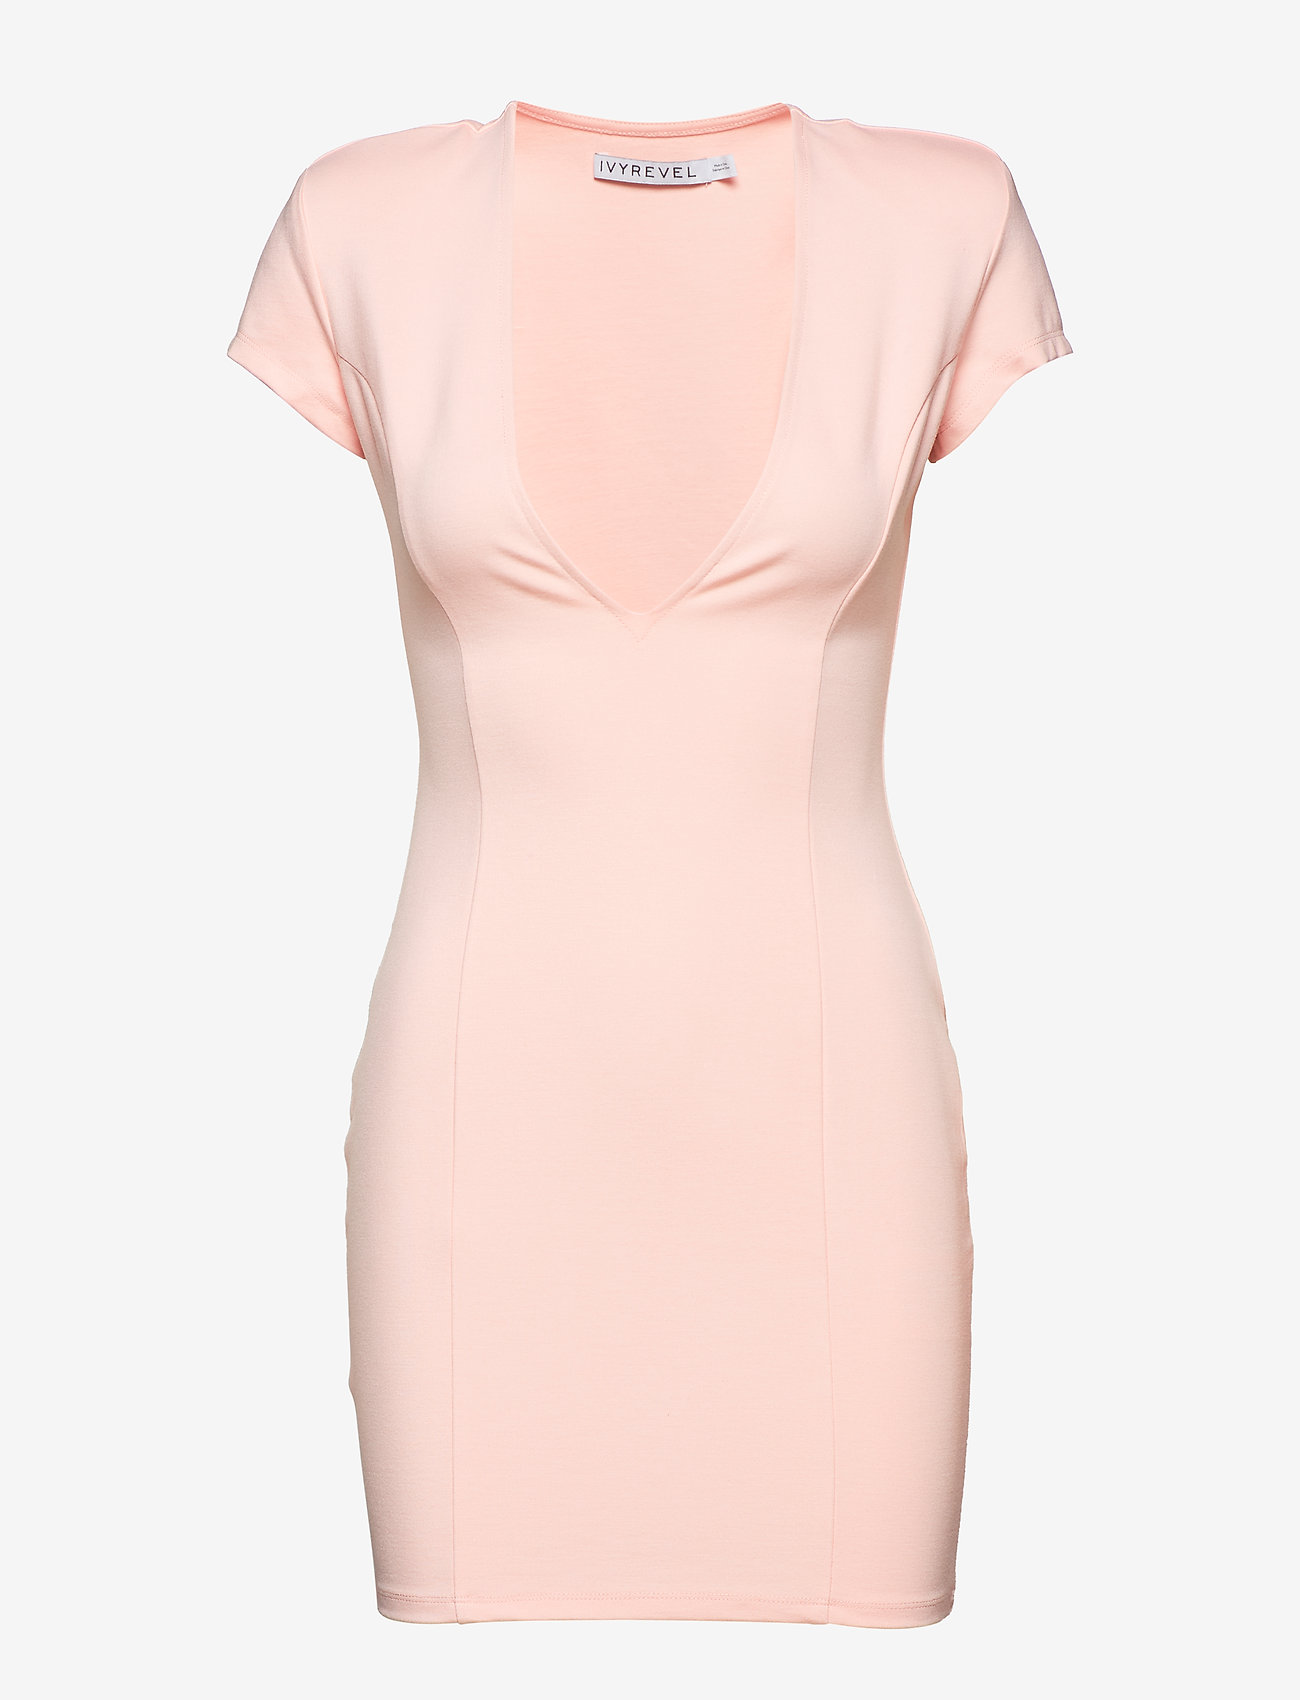 Ivyrevel - CAPPED SLEEVE PLUNGE MINI DRESS - short dresses - light pink